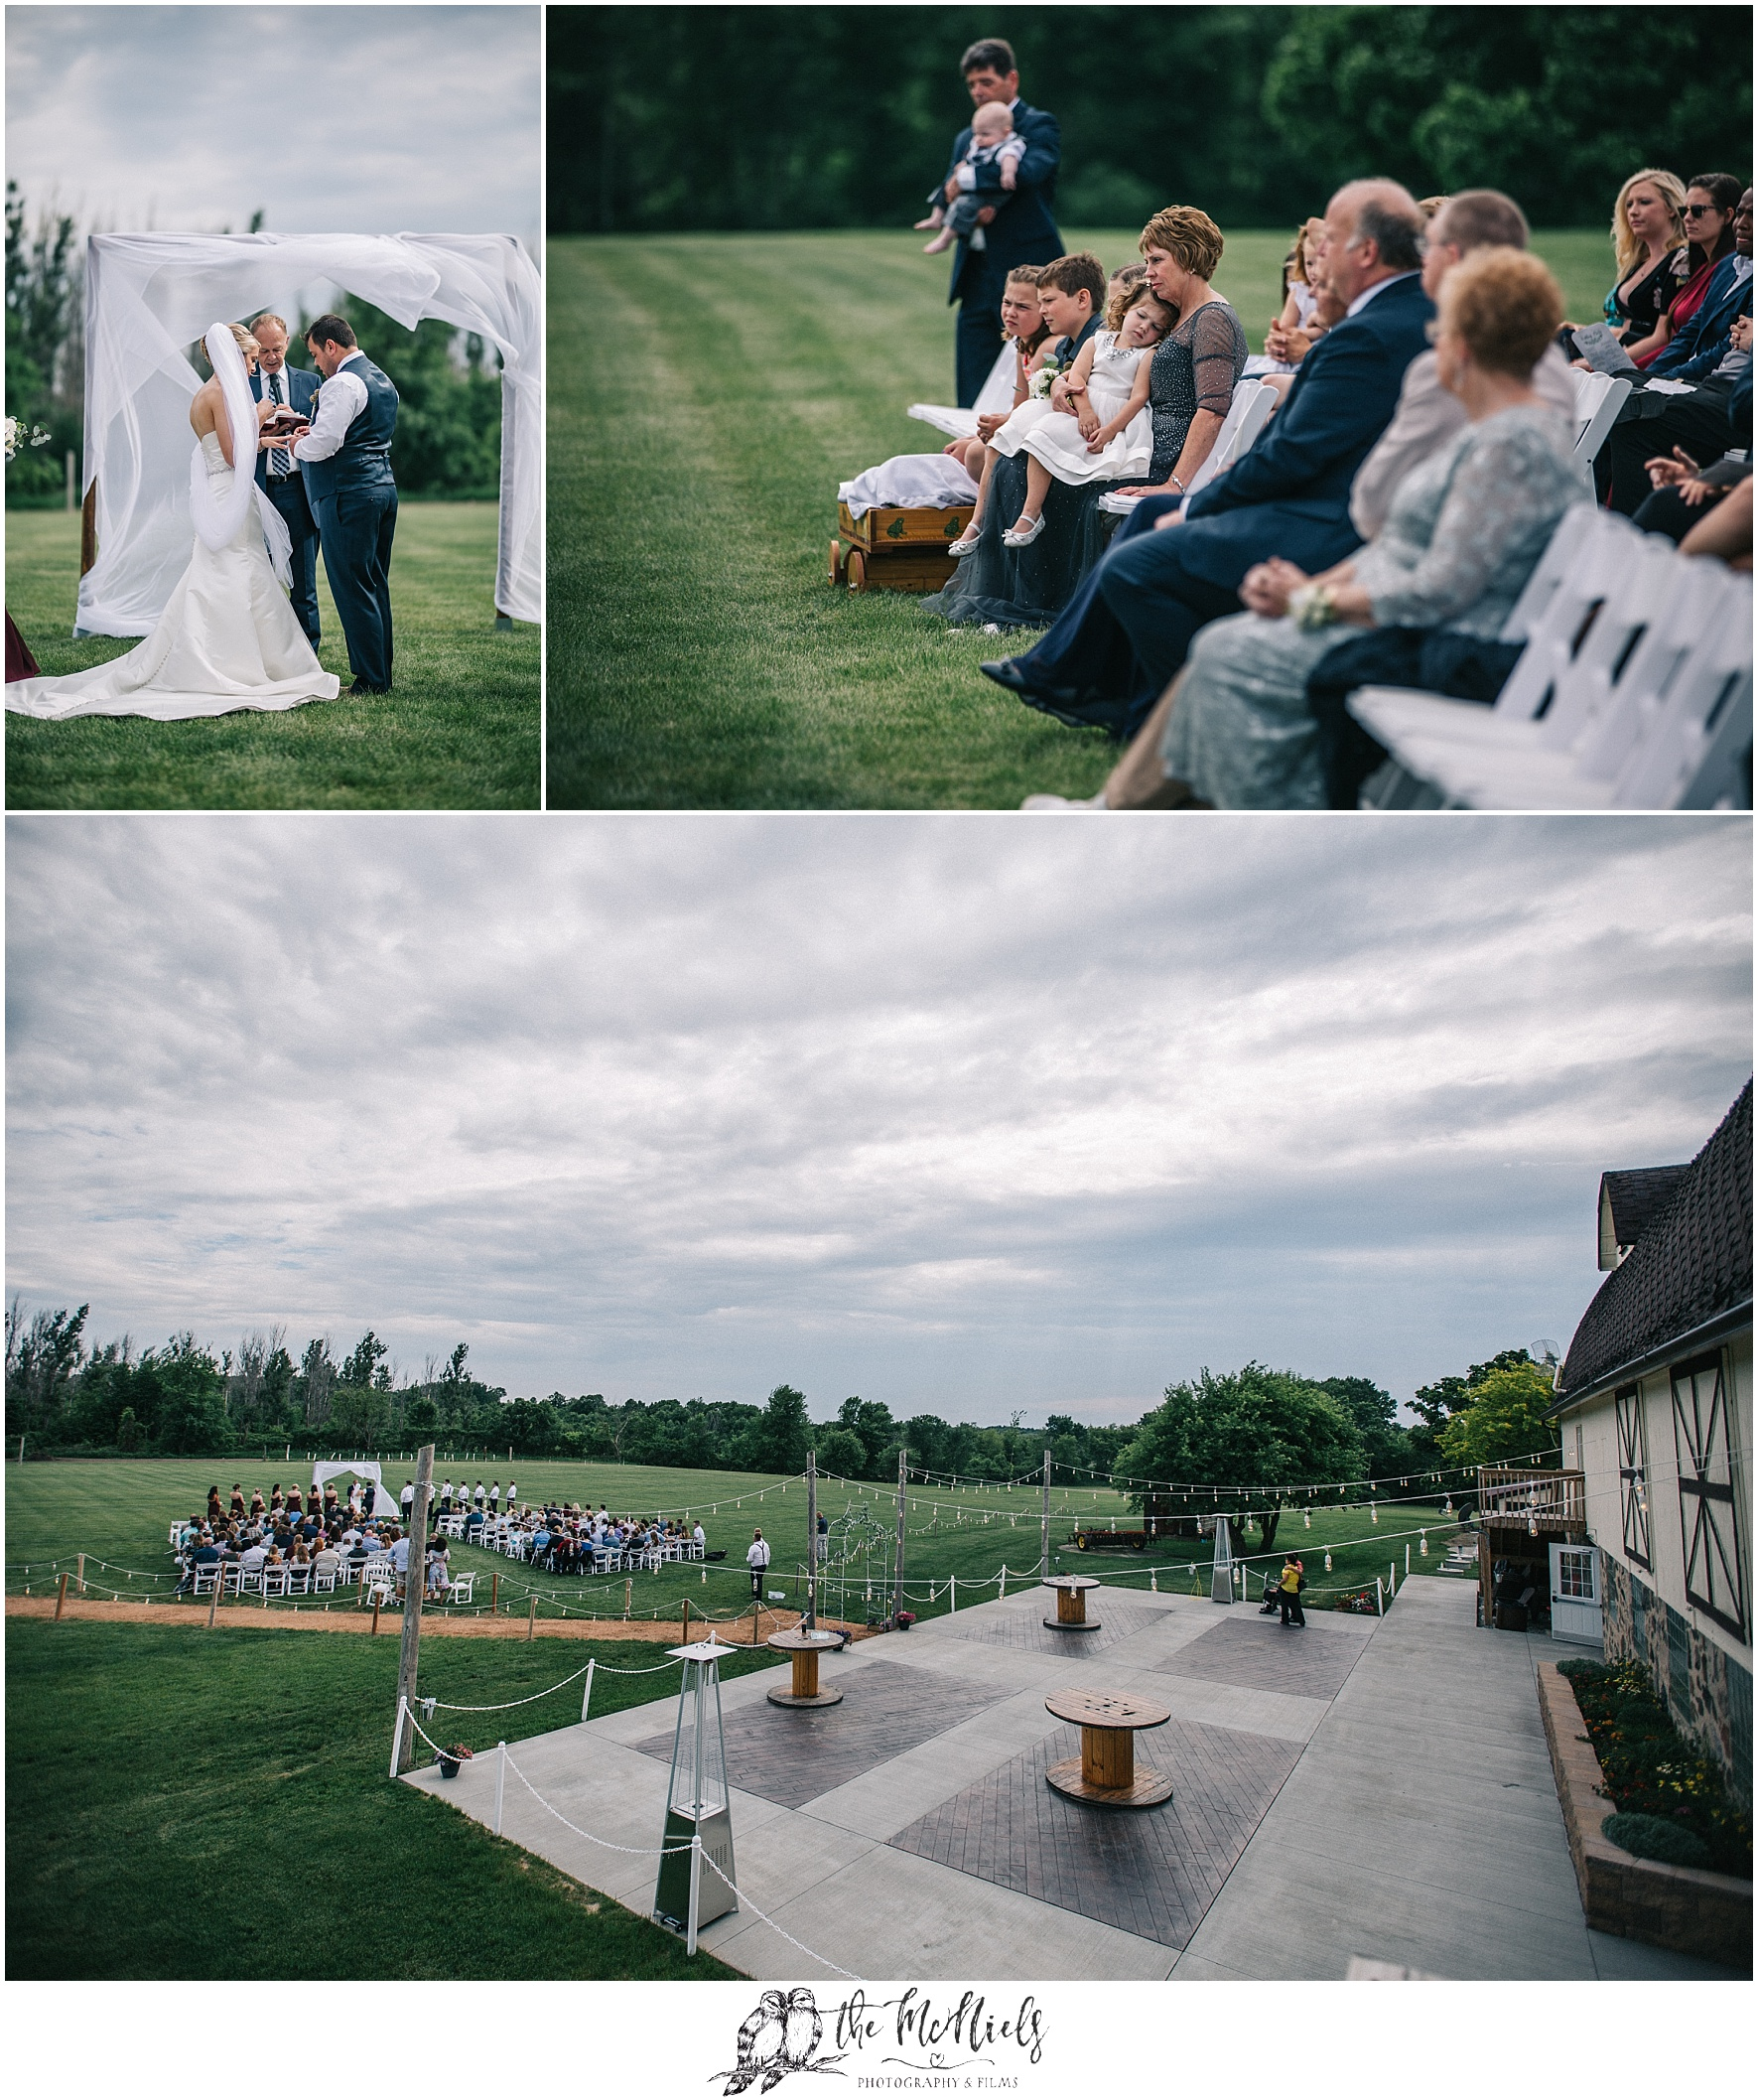 Hay Loft Barn Wedding | Watertown, WI - McNiel Photography